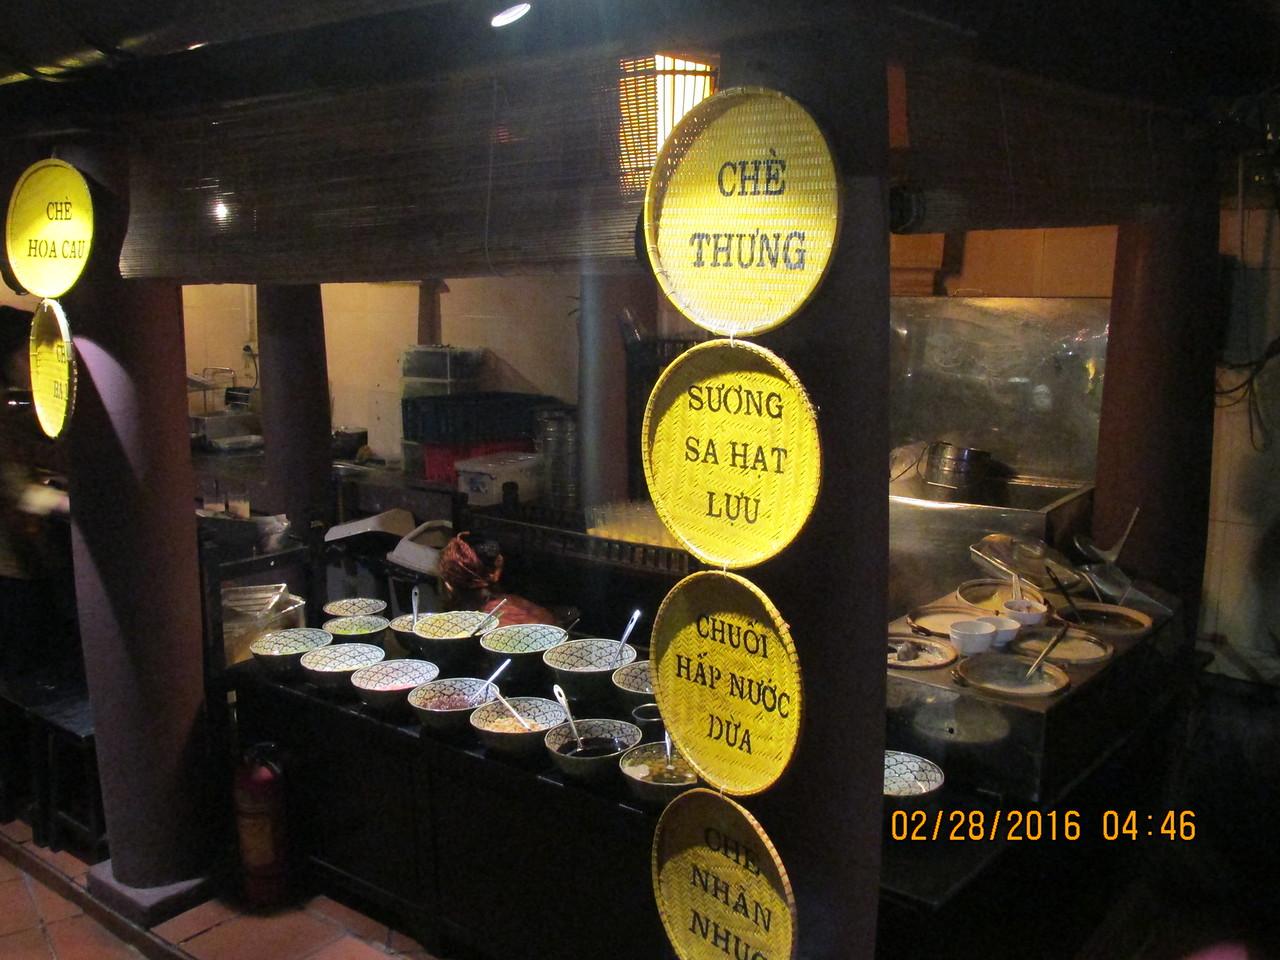 0062 - Quan An Ngon Restaurant on Phan Boi Chau - Hanoi Vietnam - Date Correct but Time on Pic is Wrong